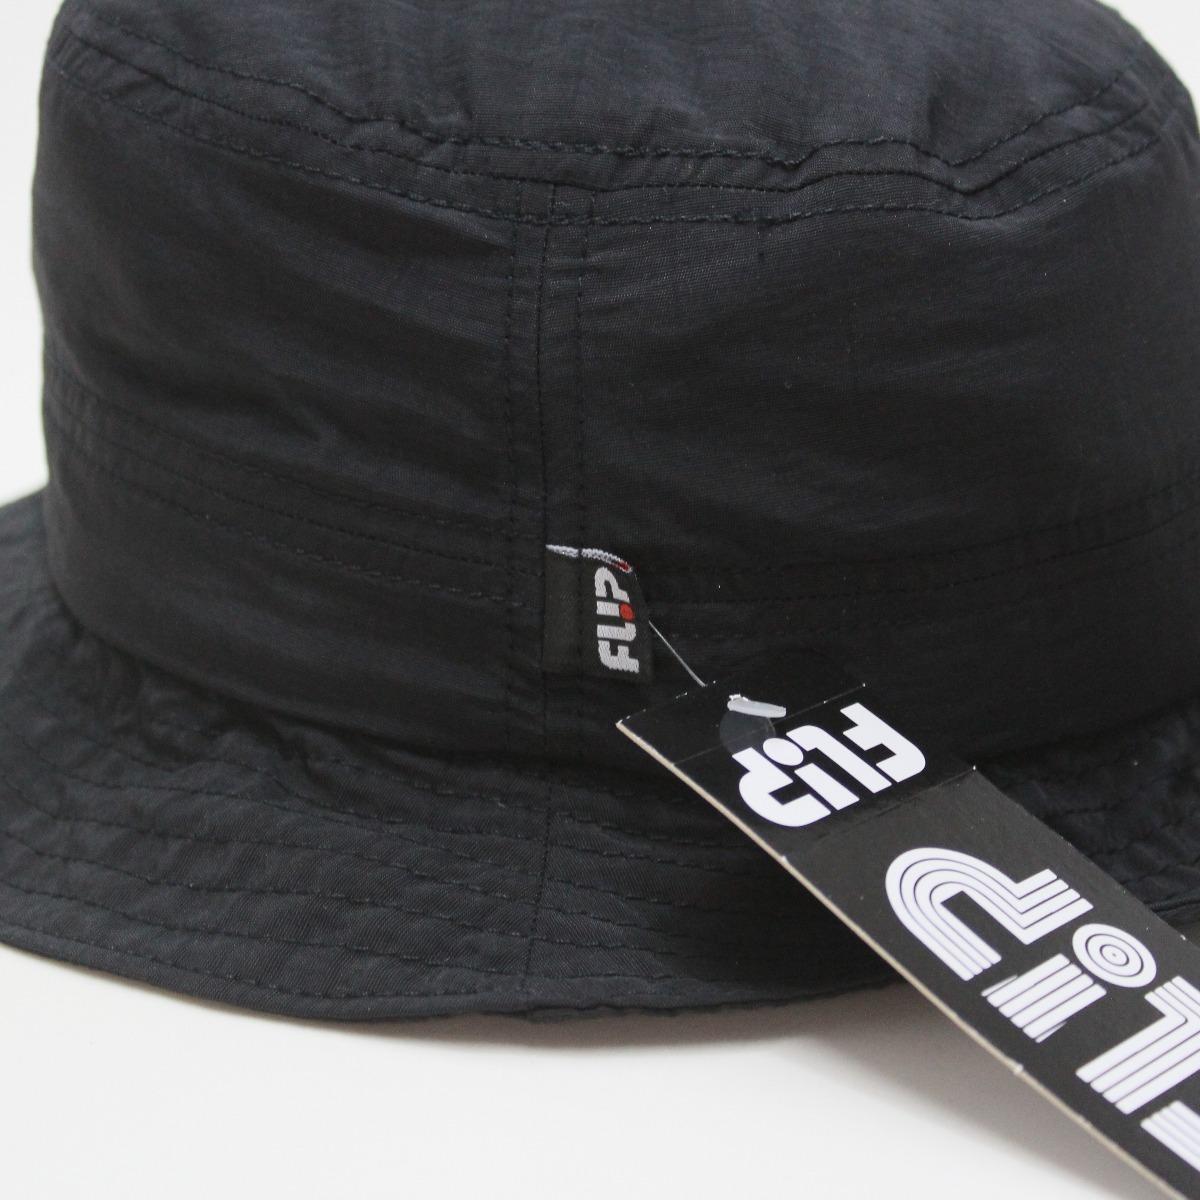 chapéu bucket hat flip odyssey original. Carregando zoom. 1a42bfd573f